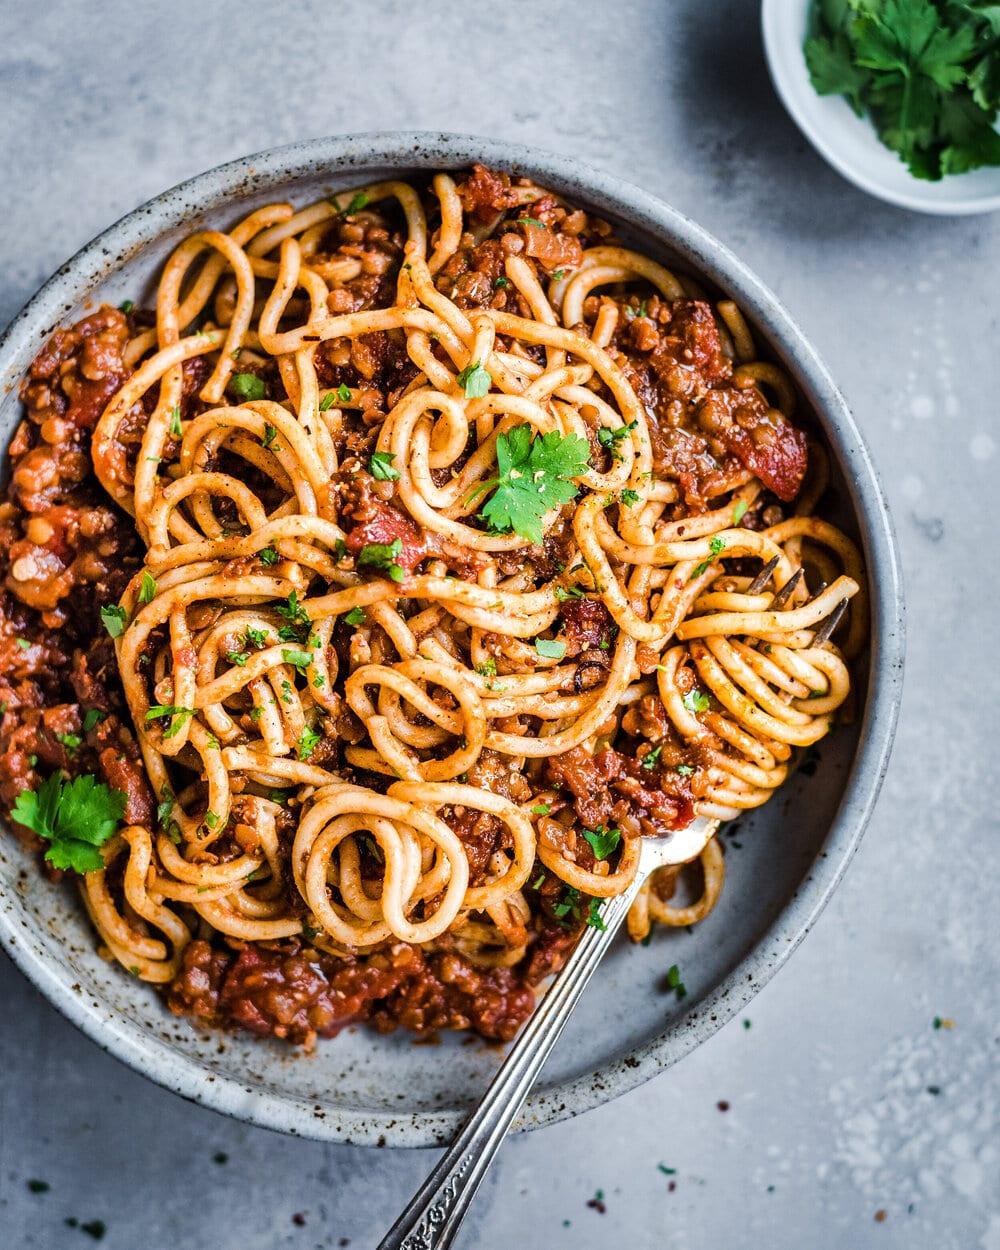 10 Healthy Vegan Lentil recipes. vegan lentil bolognese.